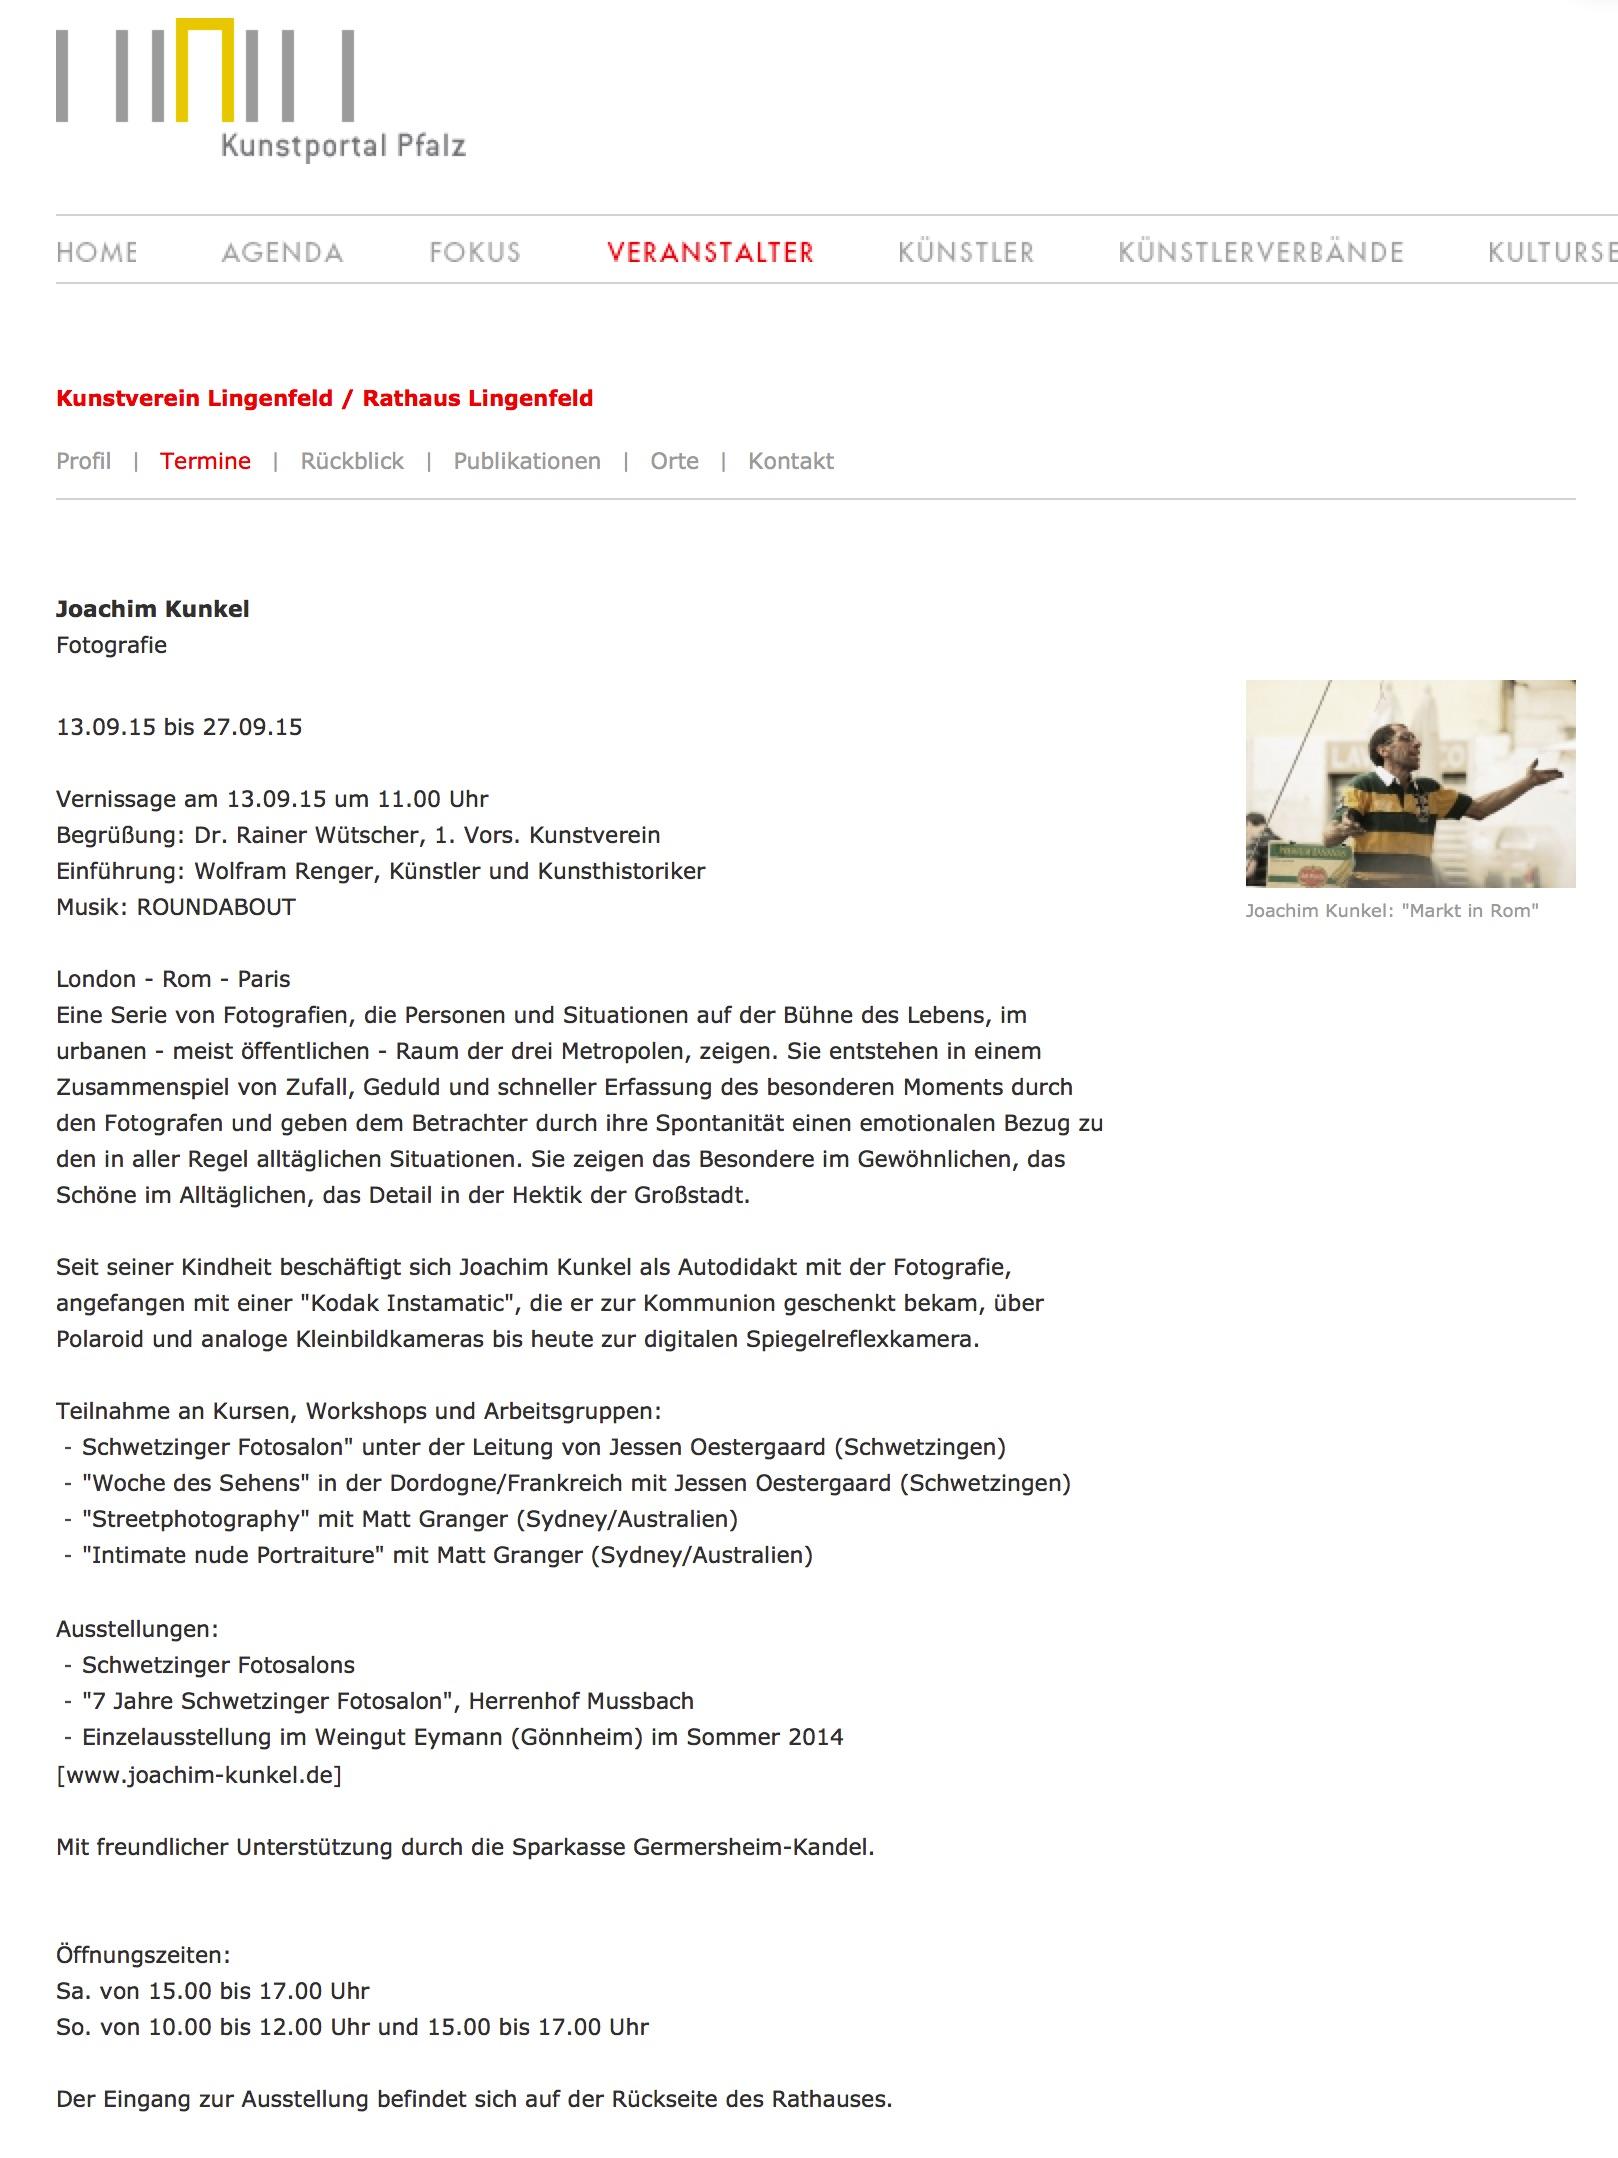 Kunstportal Pfalz1